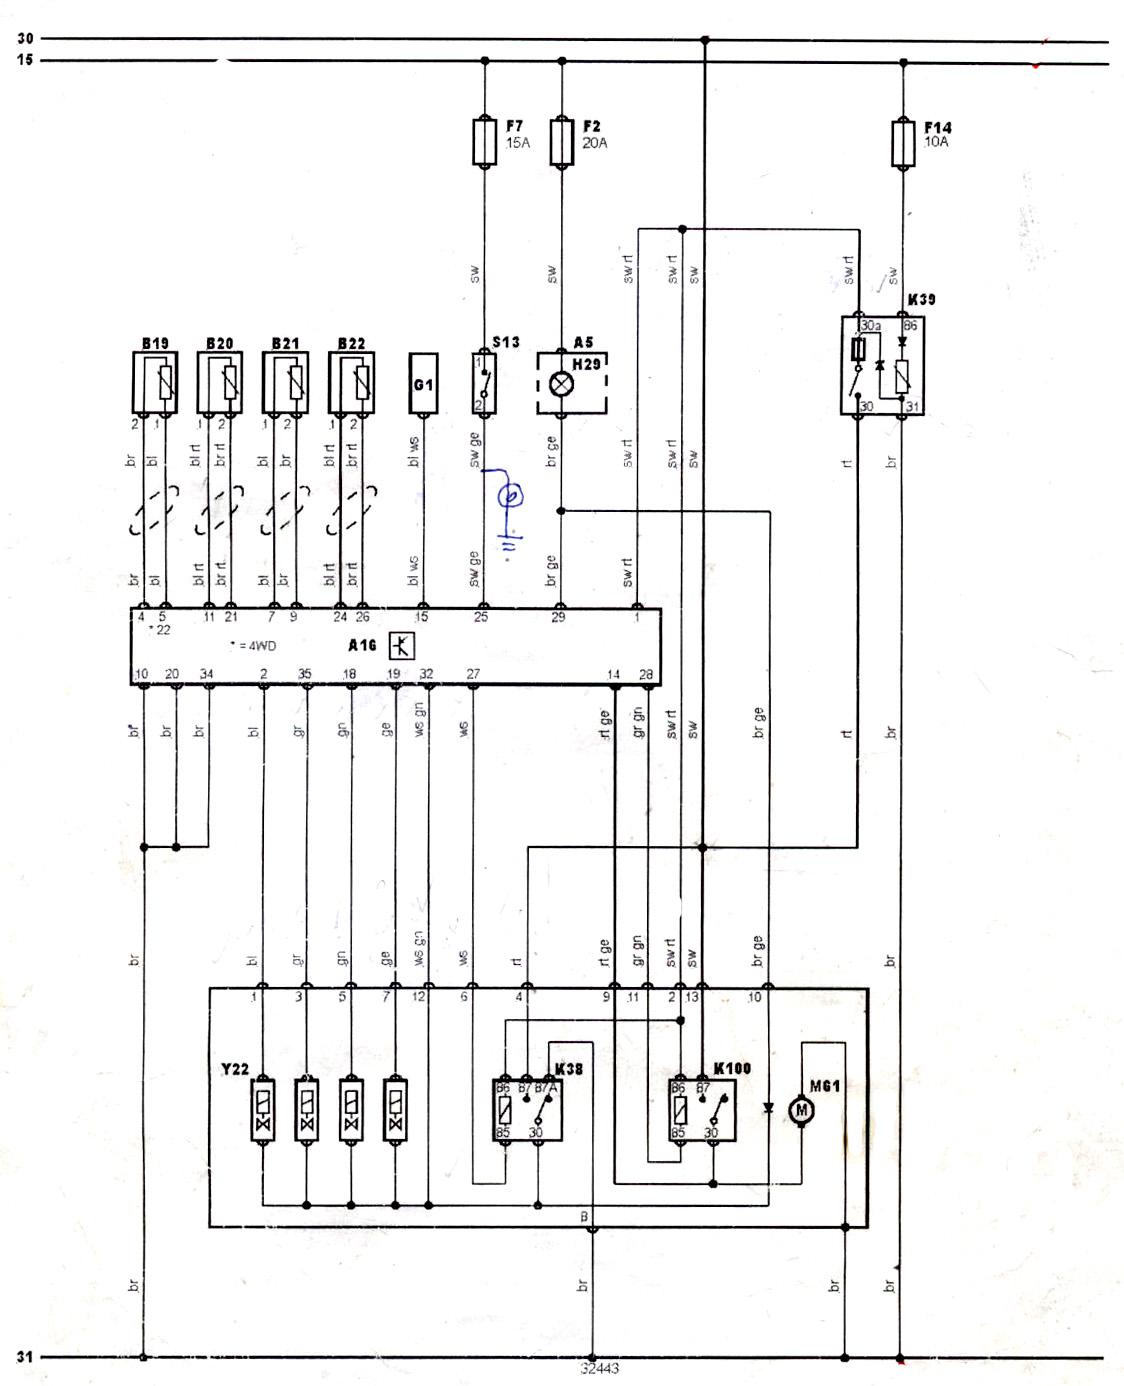 Abs Ecu Wiring Diagram - Block And Schematic Diagrams •